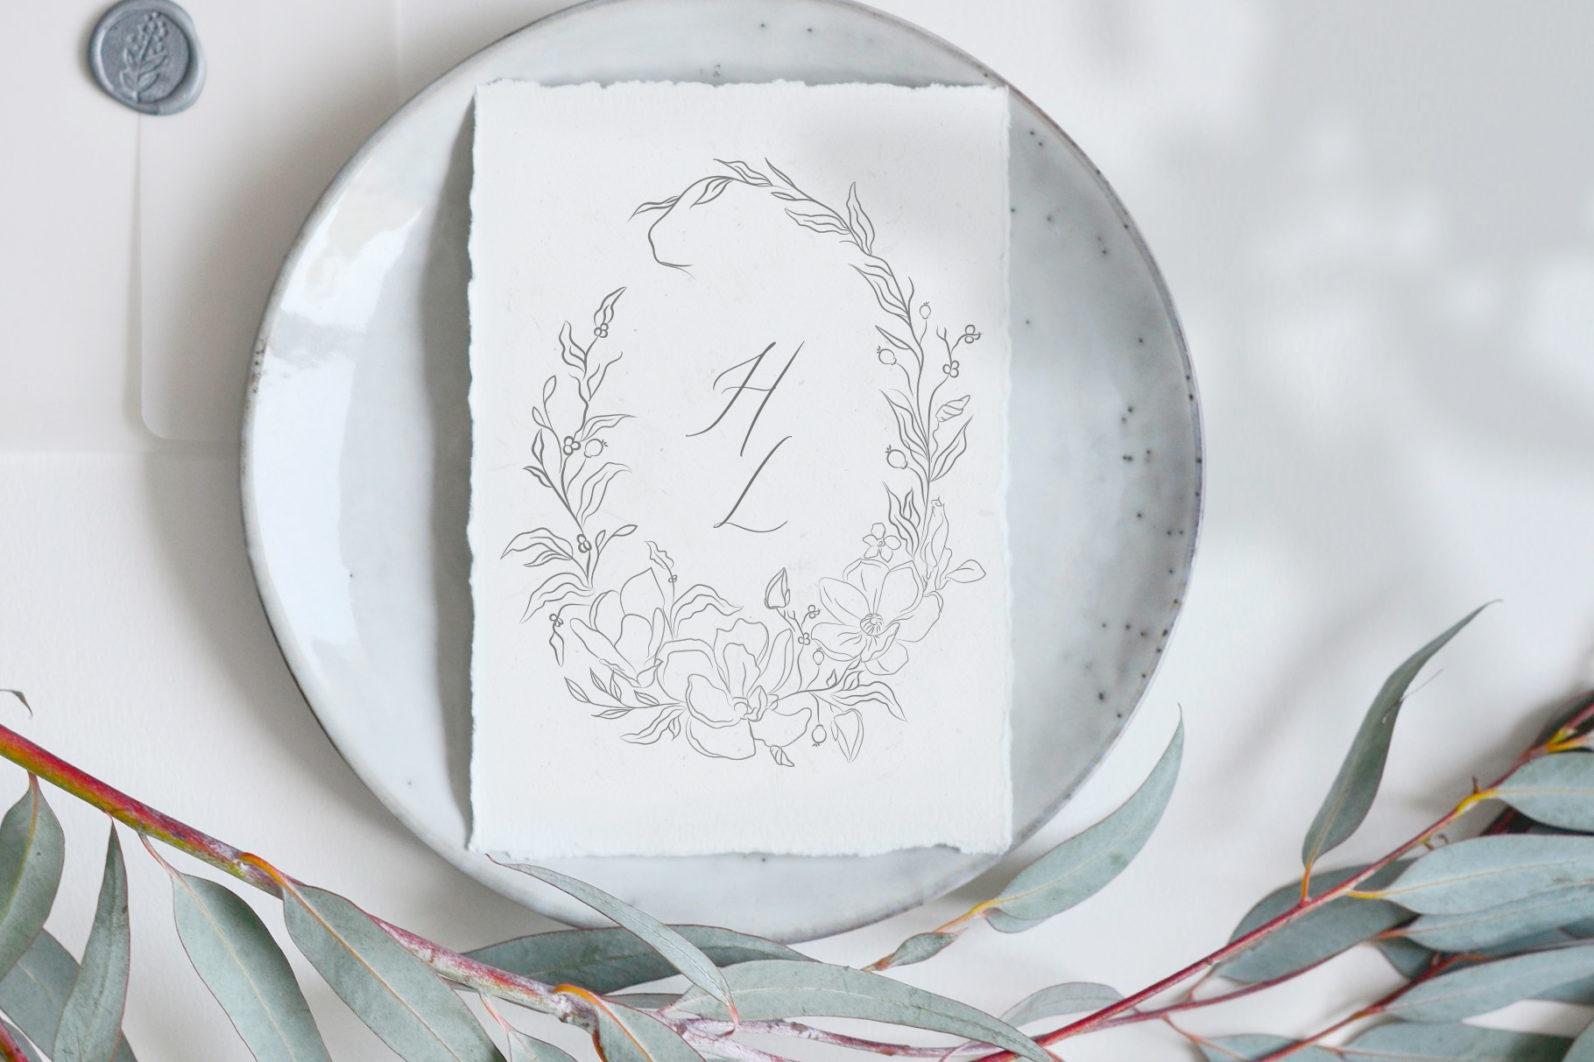 Floral Decorative Ornate Wreaths - ornate wreaths 6 -